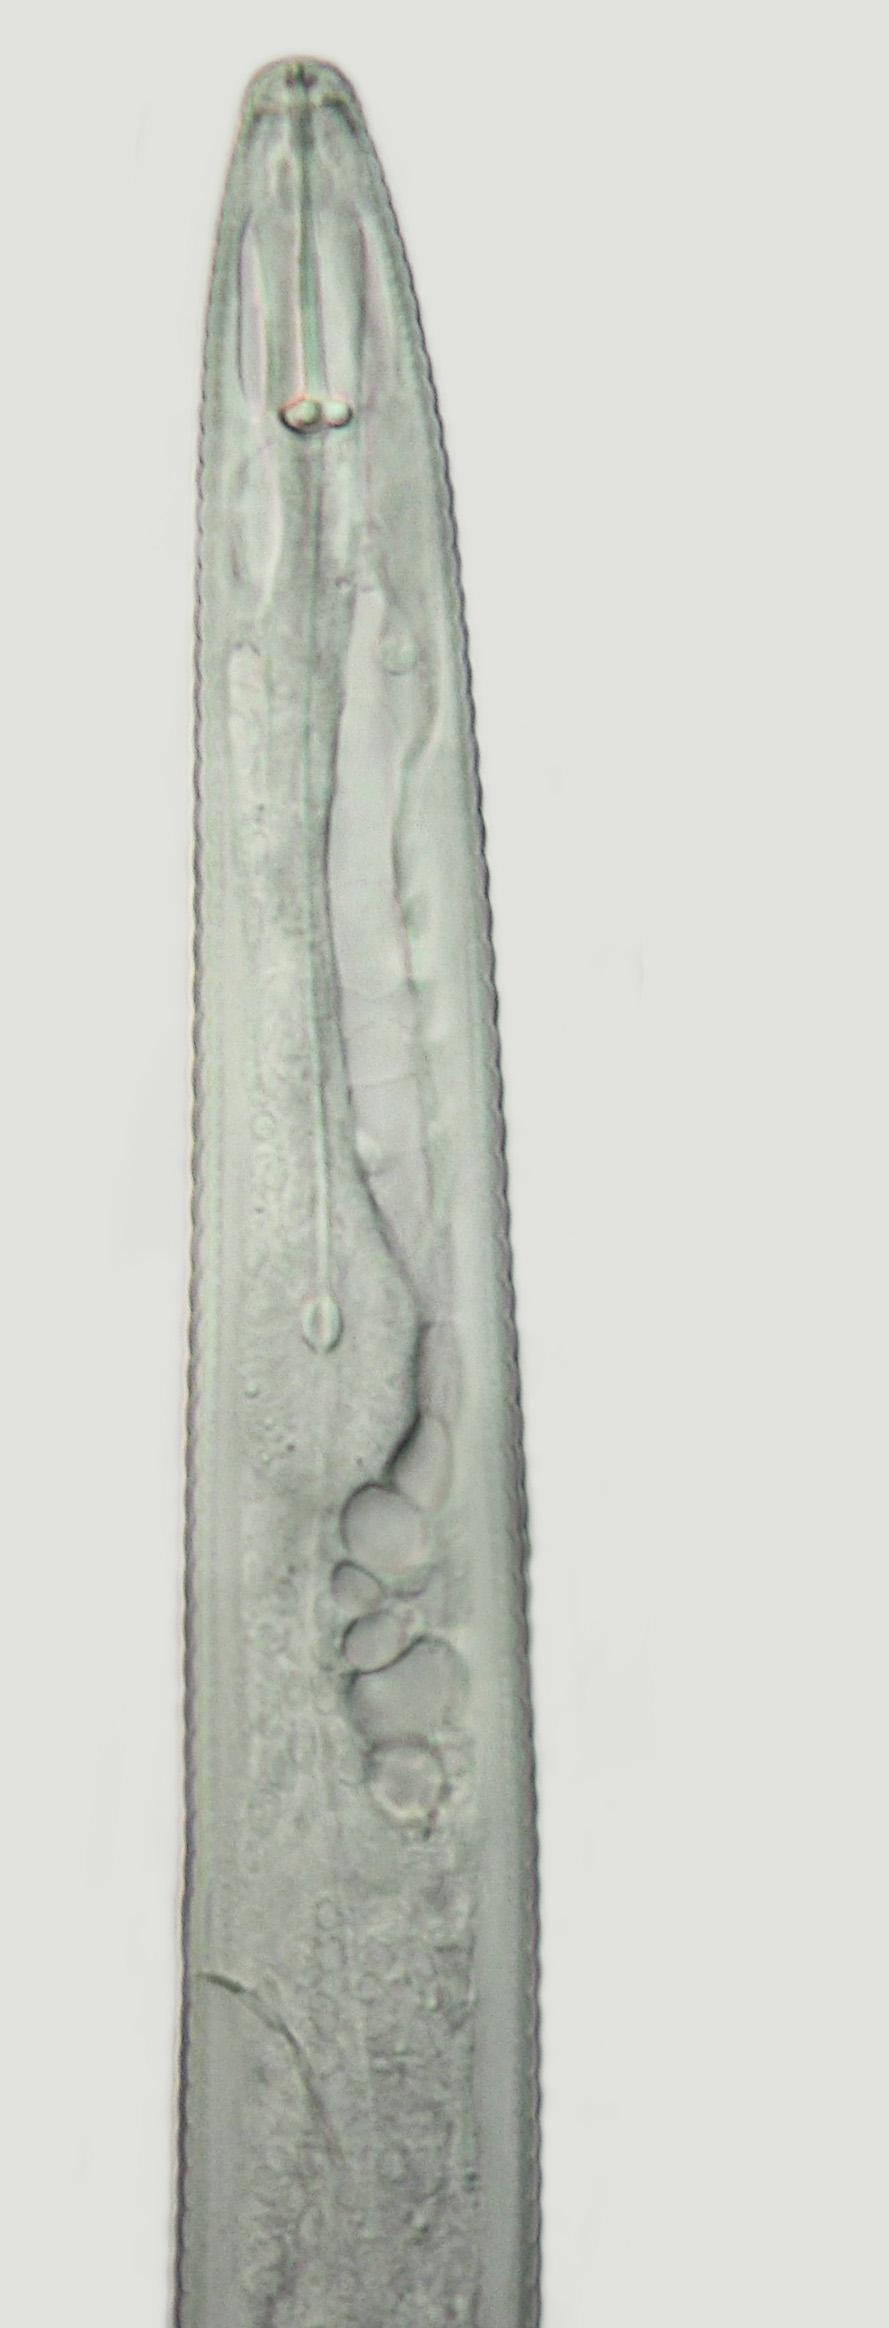 Species comparisons-Helicotylenchus heads